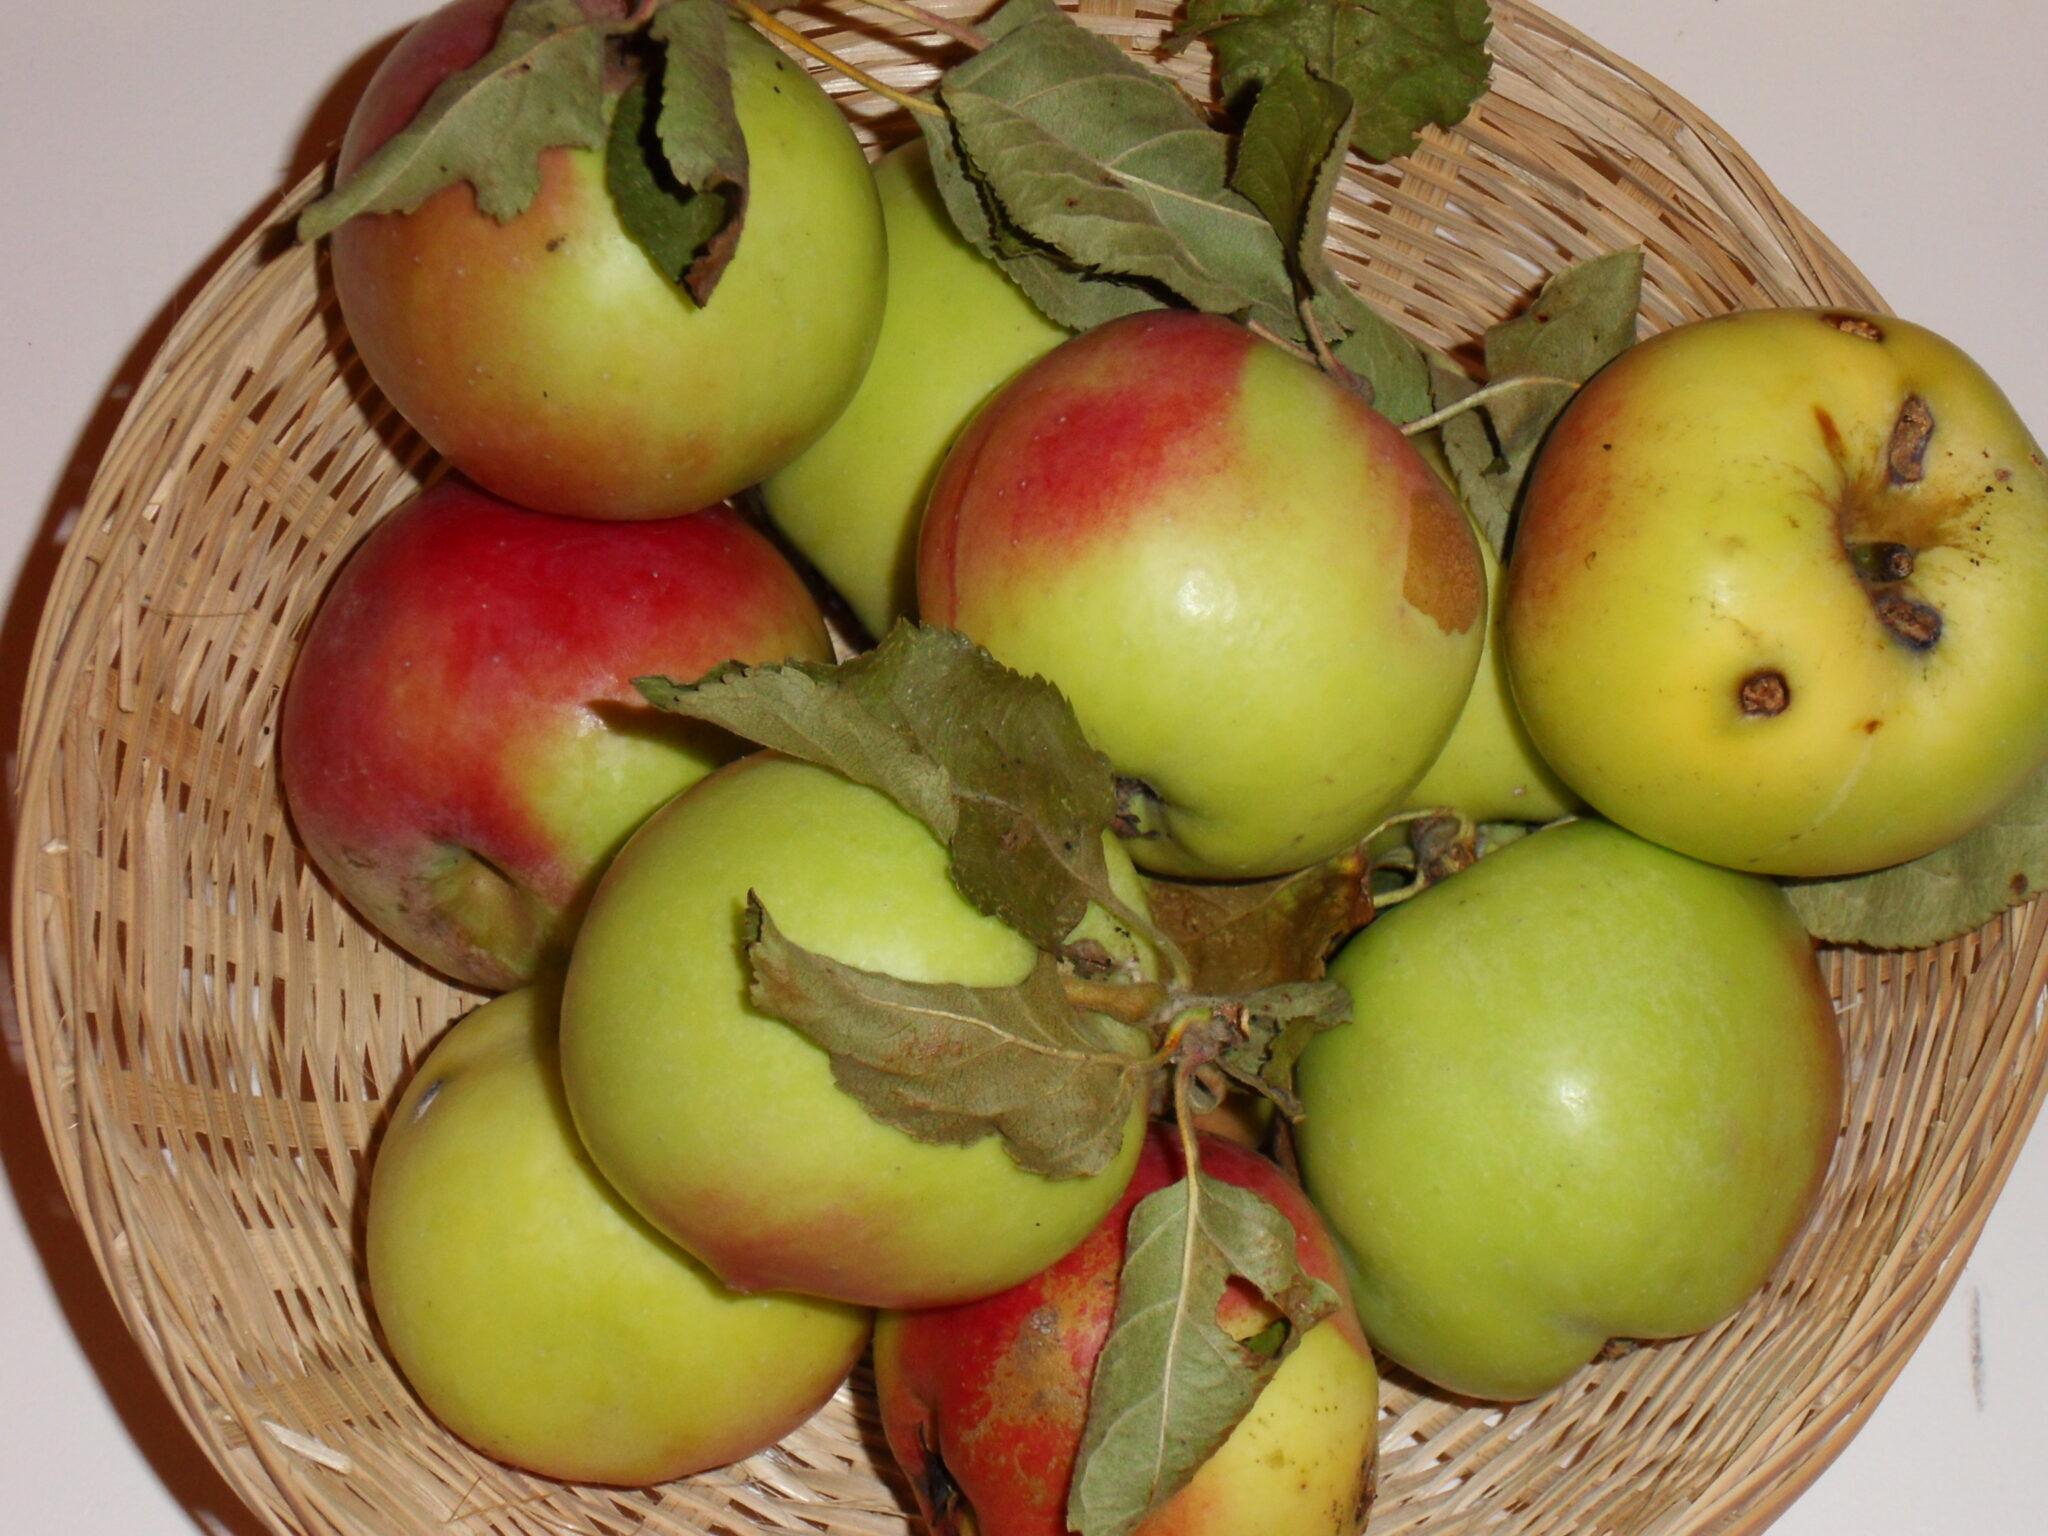 Carpo (fruit).